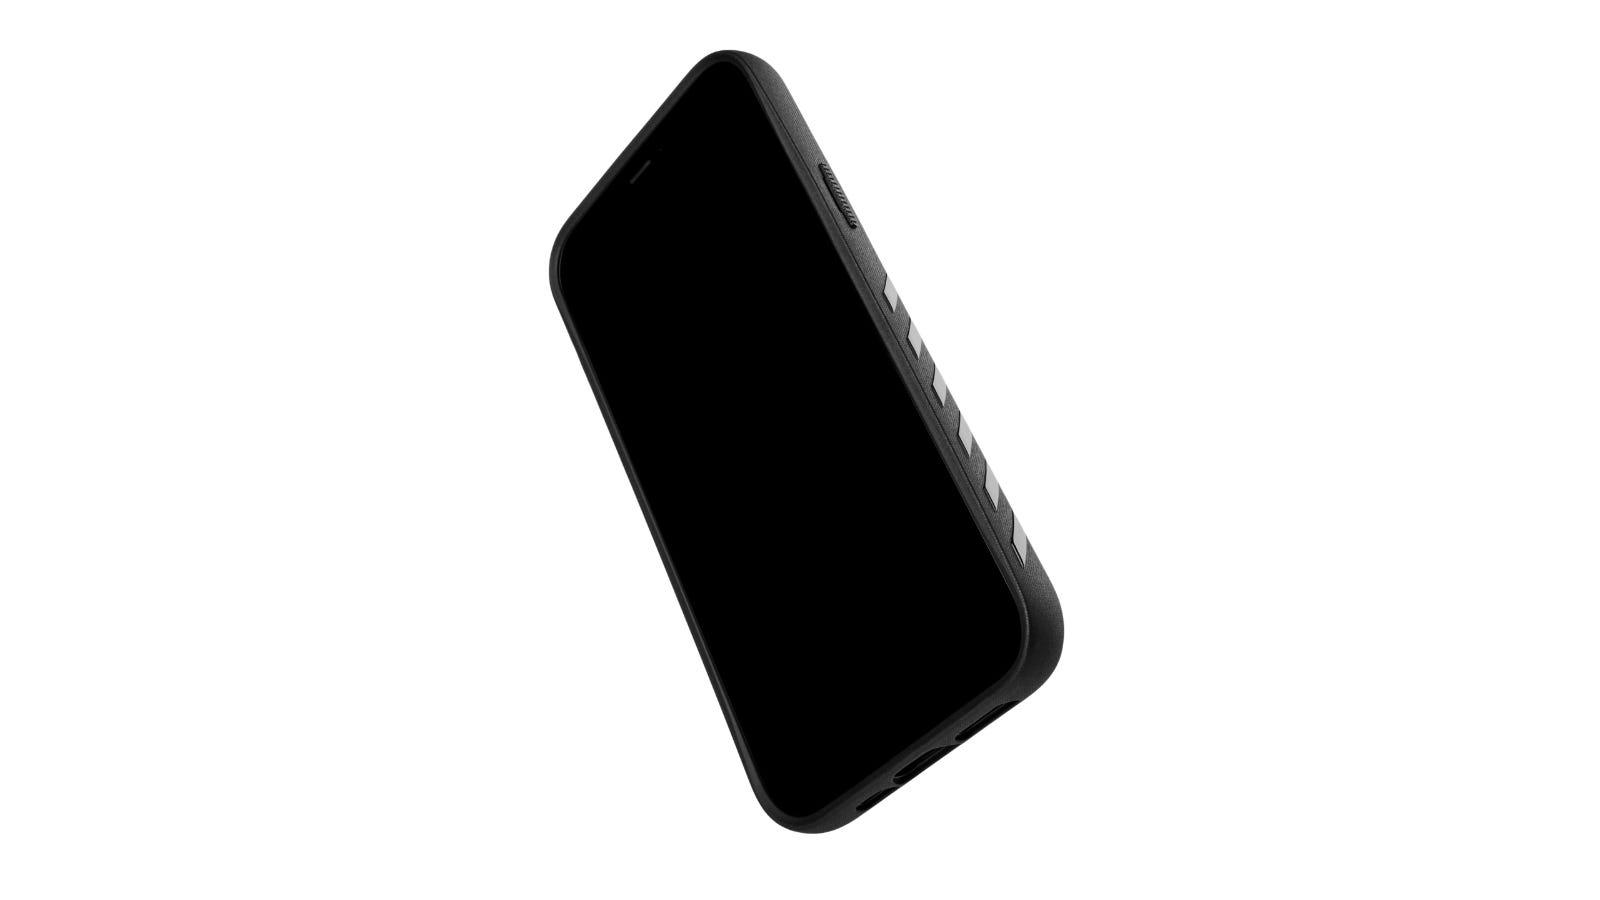 dbrand generic Grip Phone Case